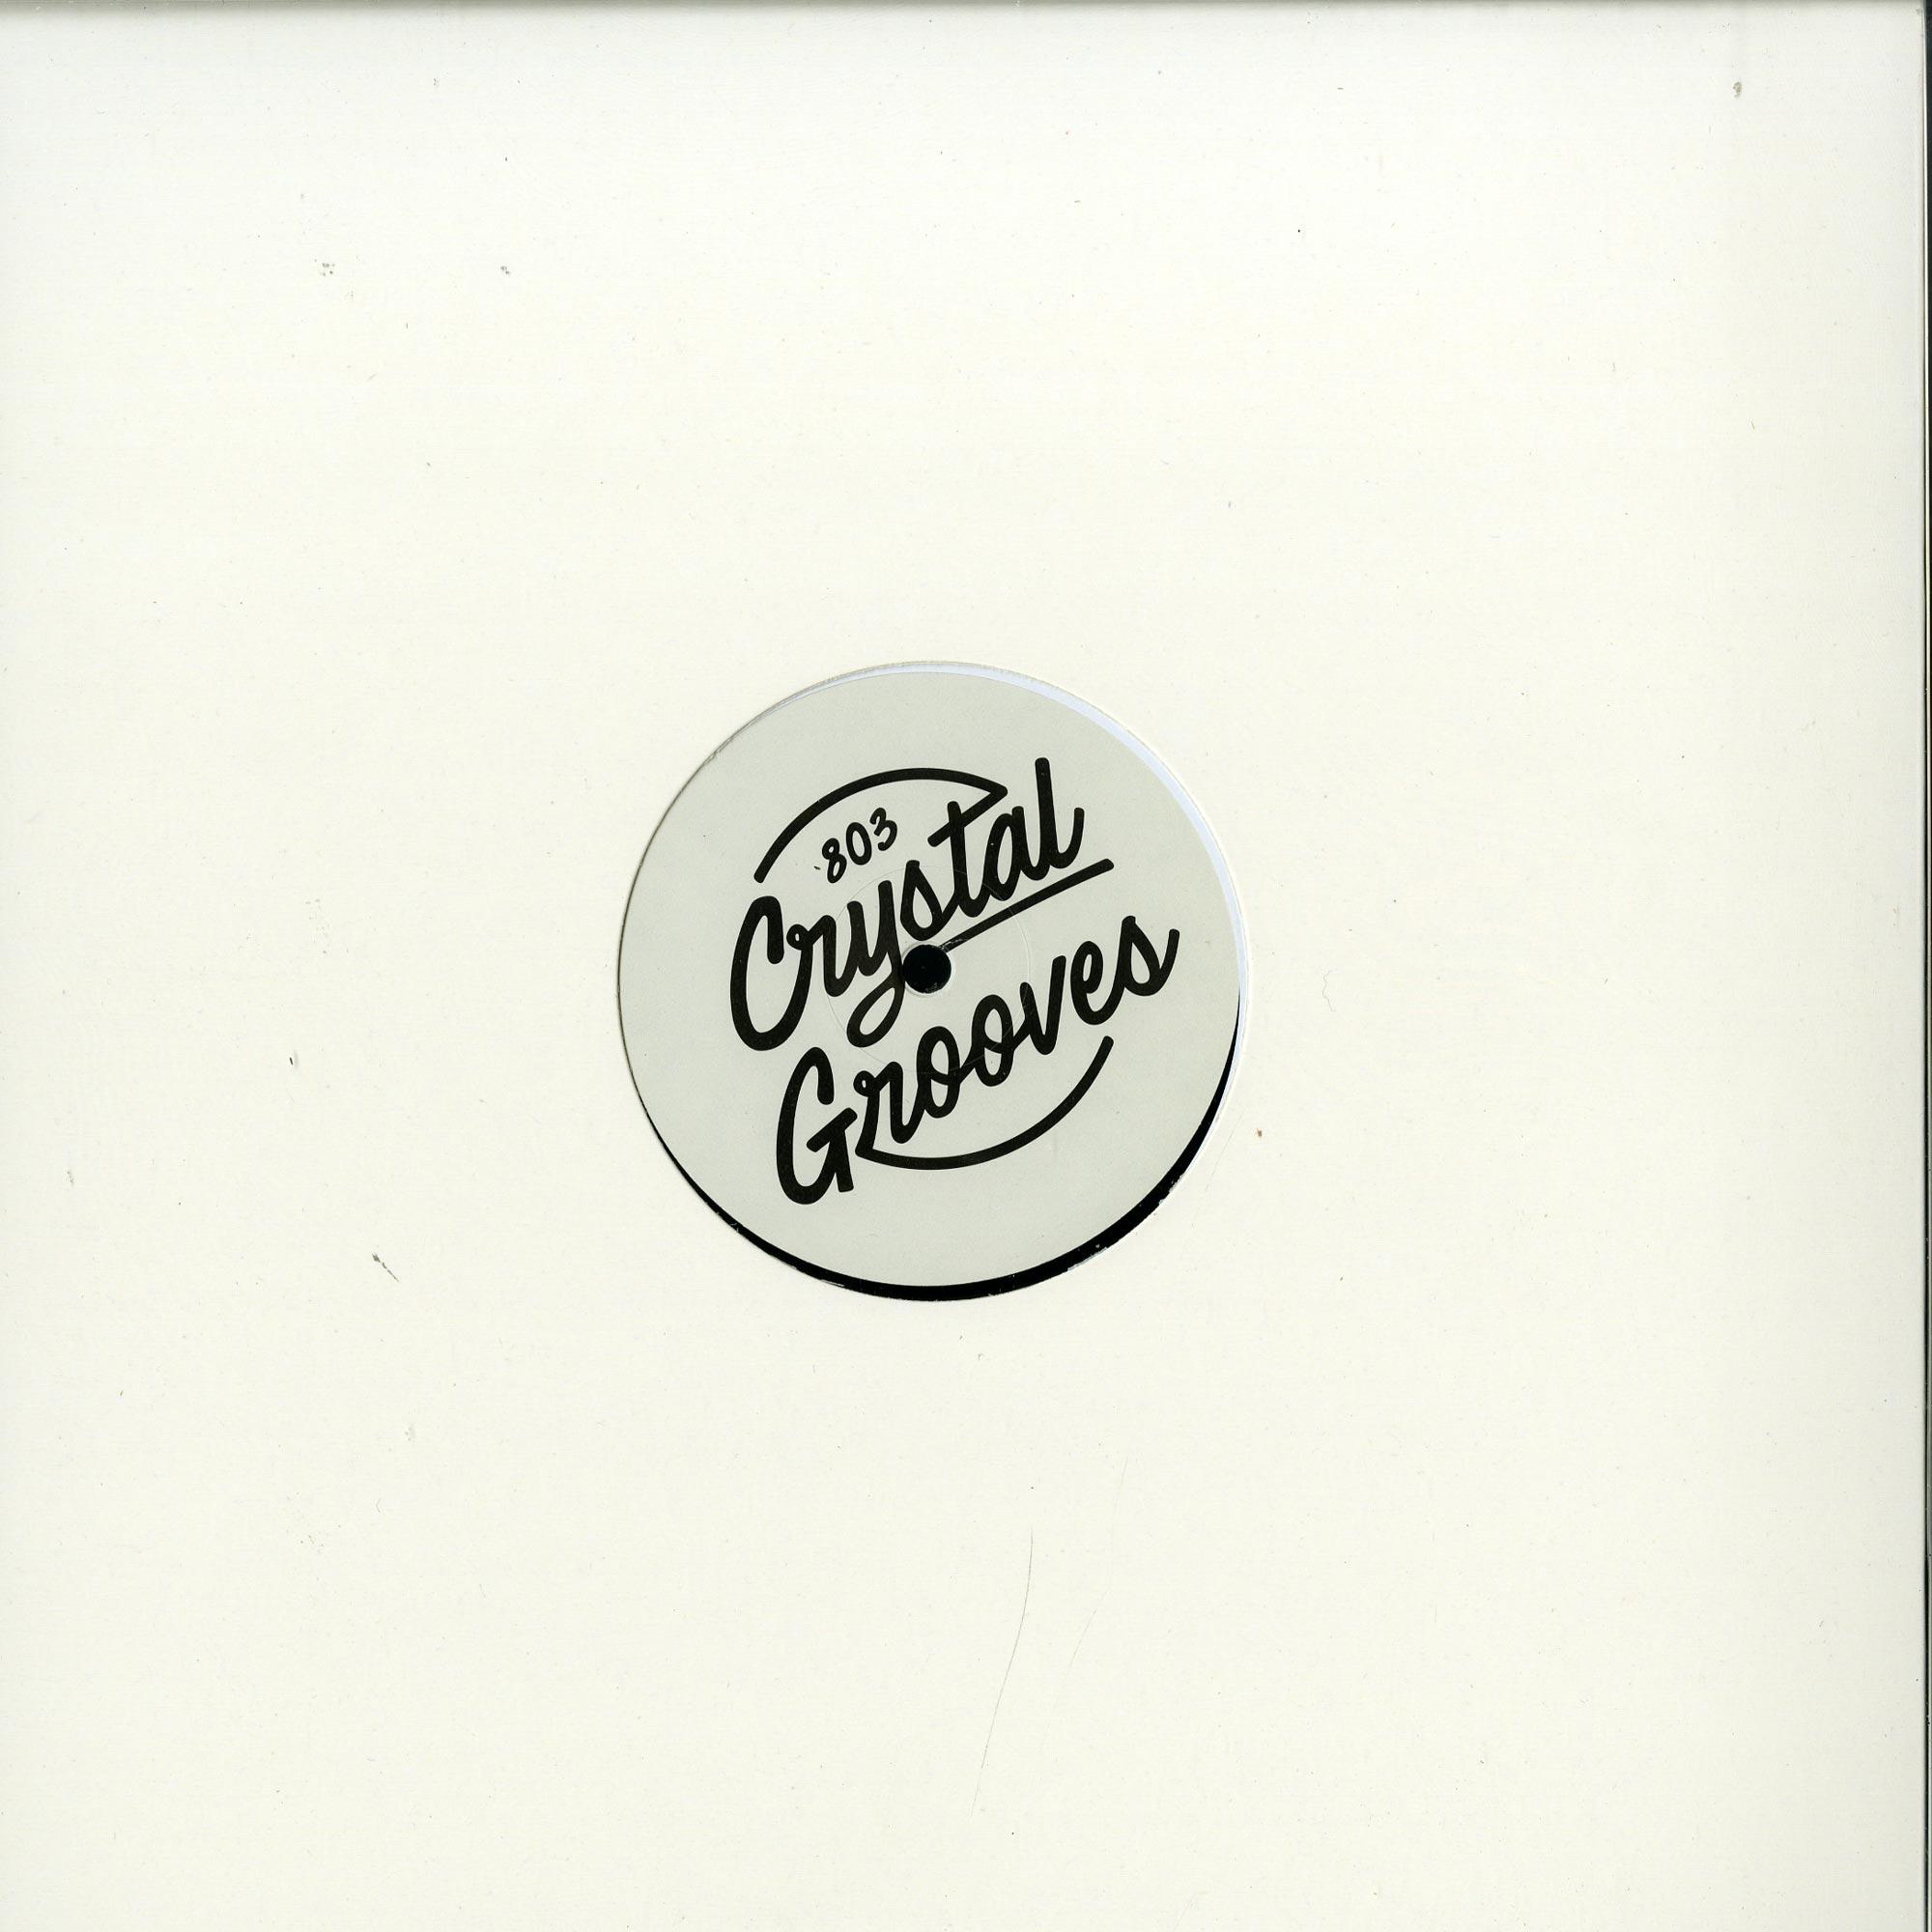 Cinthie - 803 CRYSTALGROOVES 001